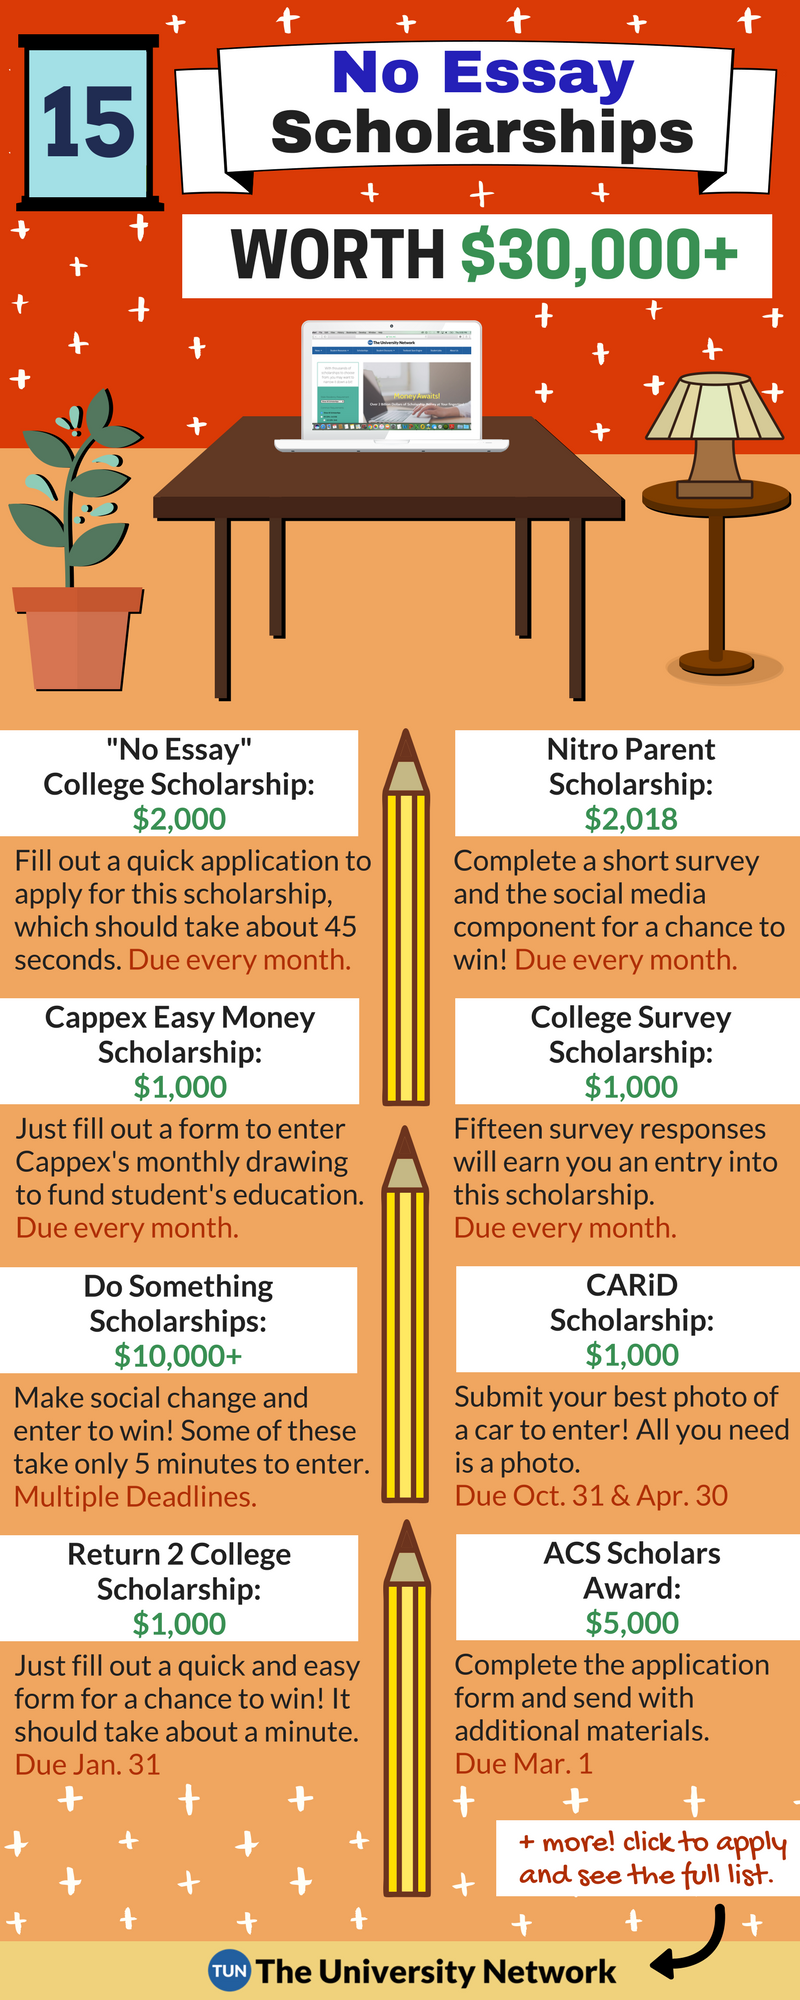 009 No Essay Scholarships For High School Seniors Rare 2017 2019 Full